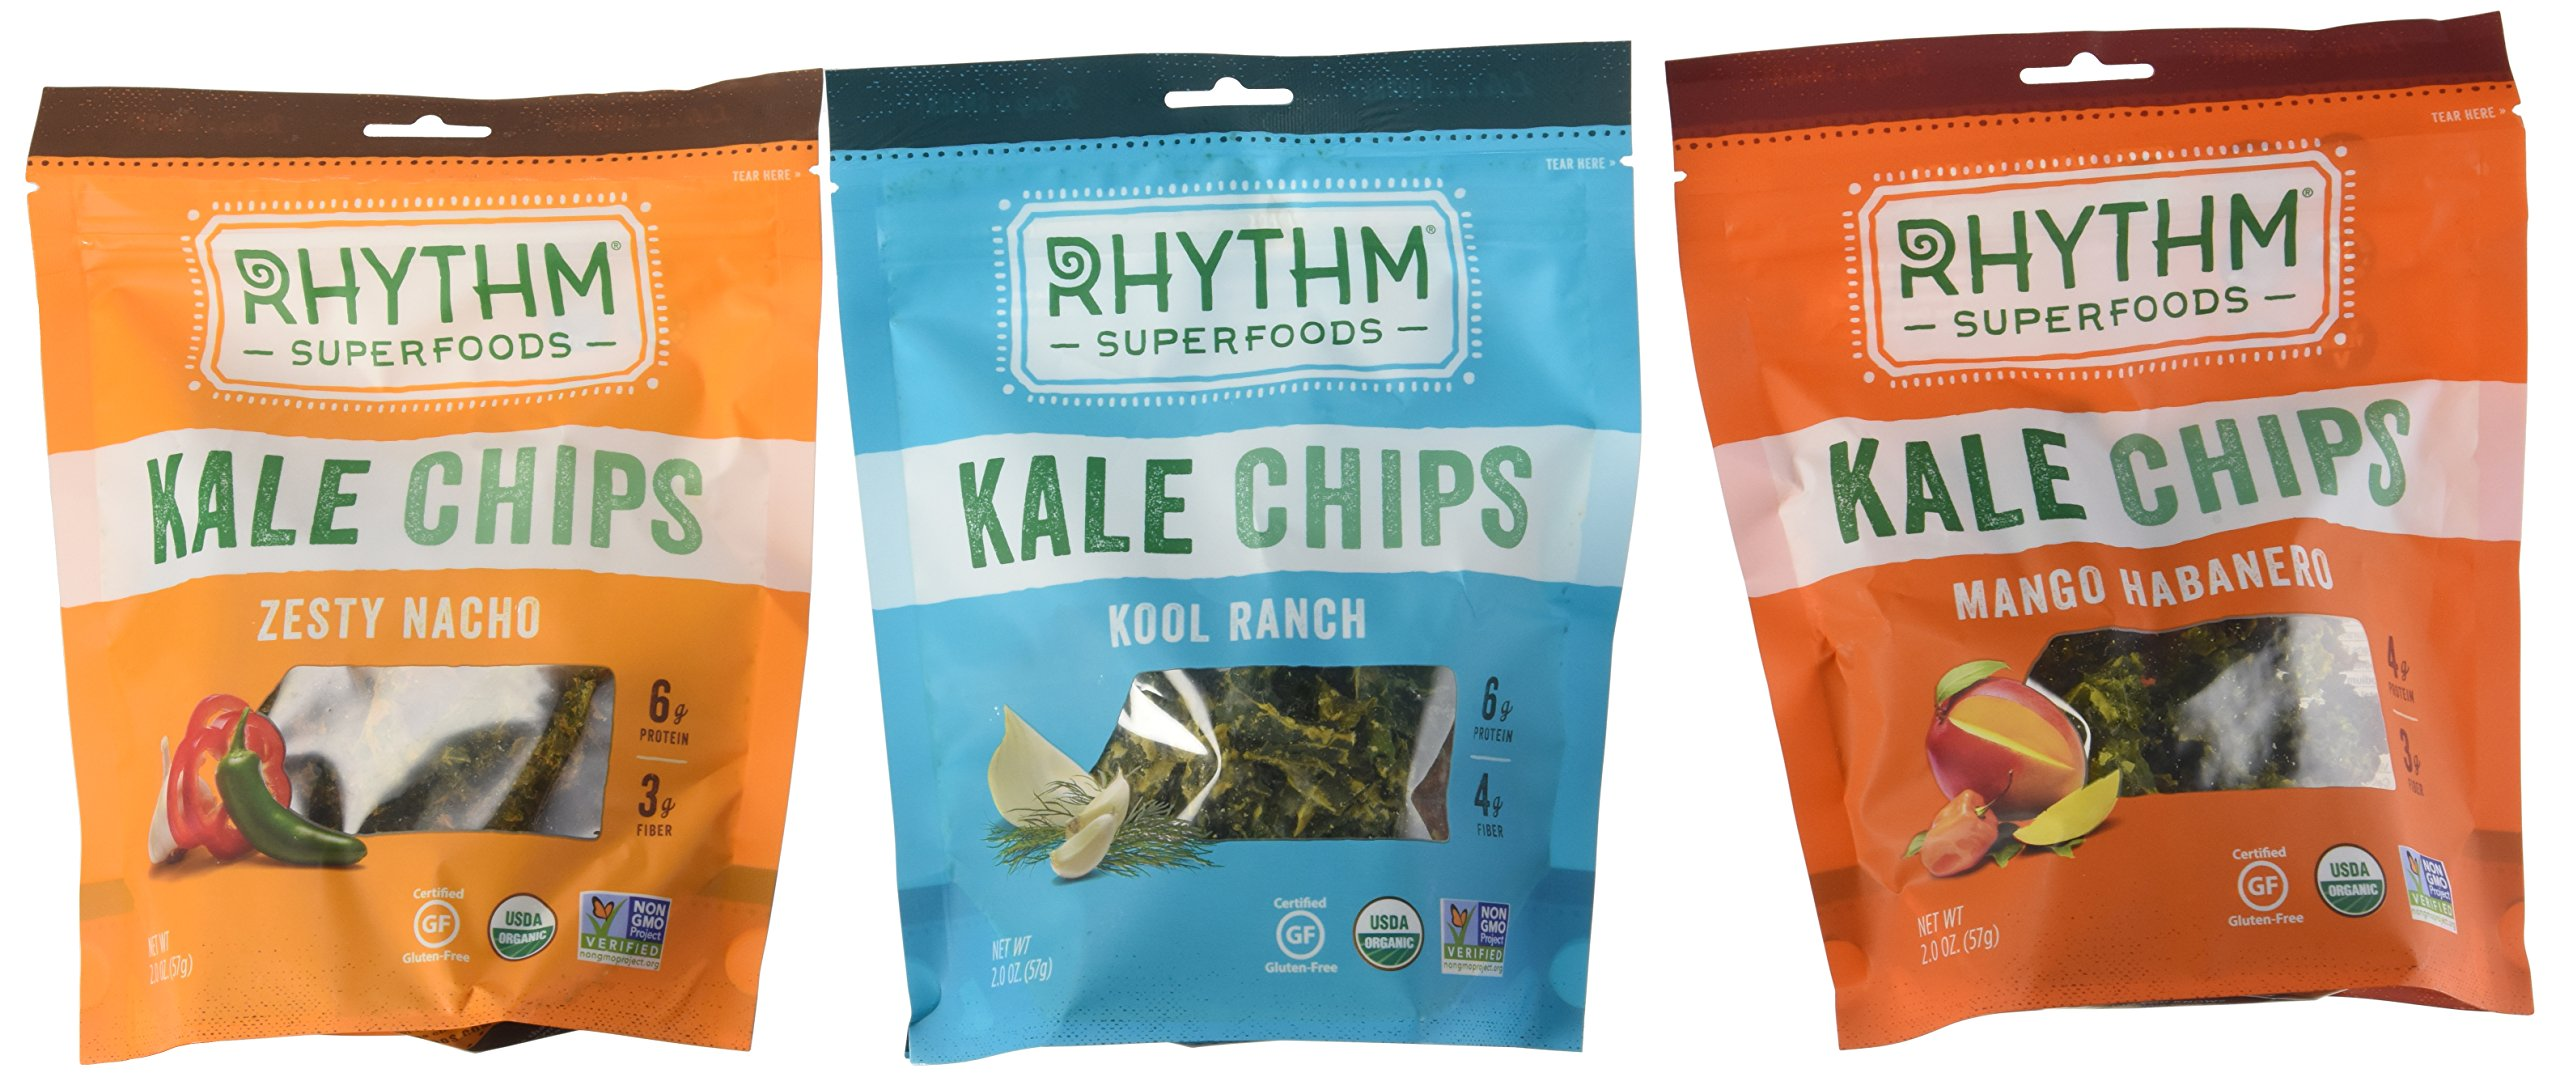 Rhythm Superfoods Kale Chips Variety Pack - Kool Ranch, Mango Habanero, Zesty Nacho by Rythym Superfoods